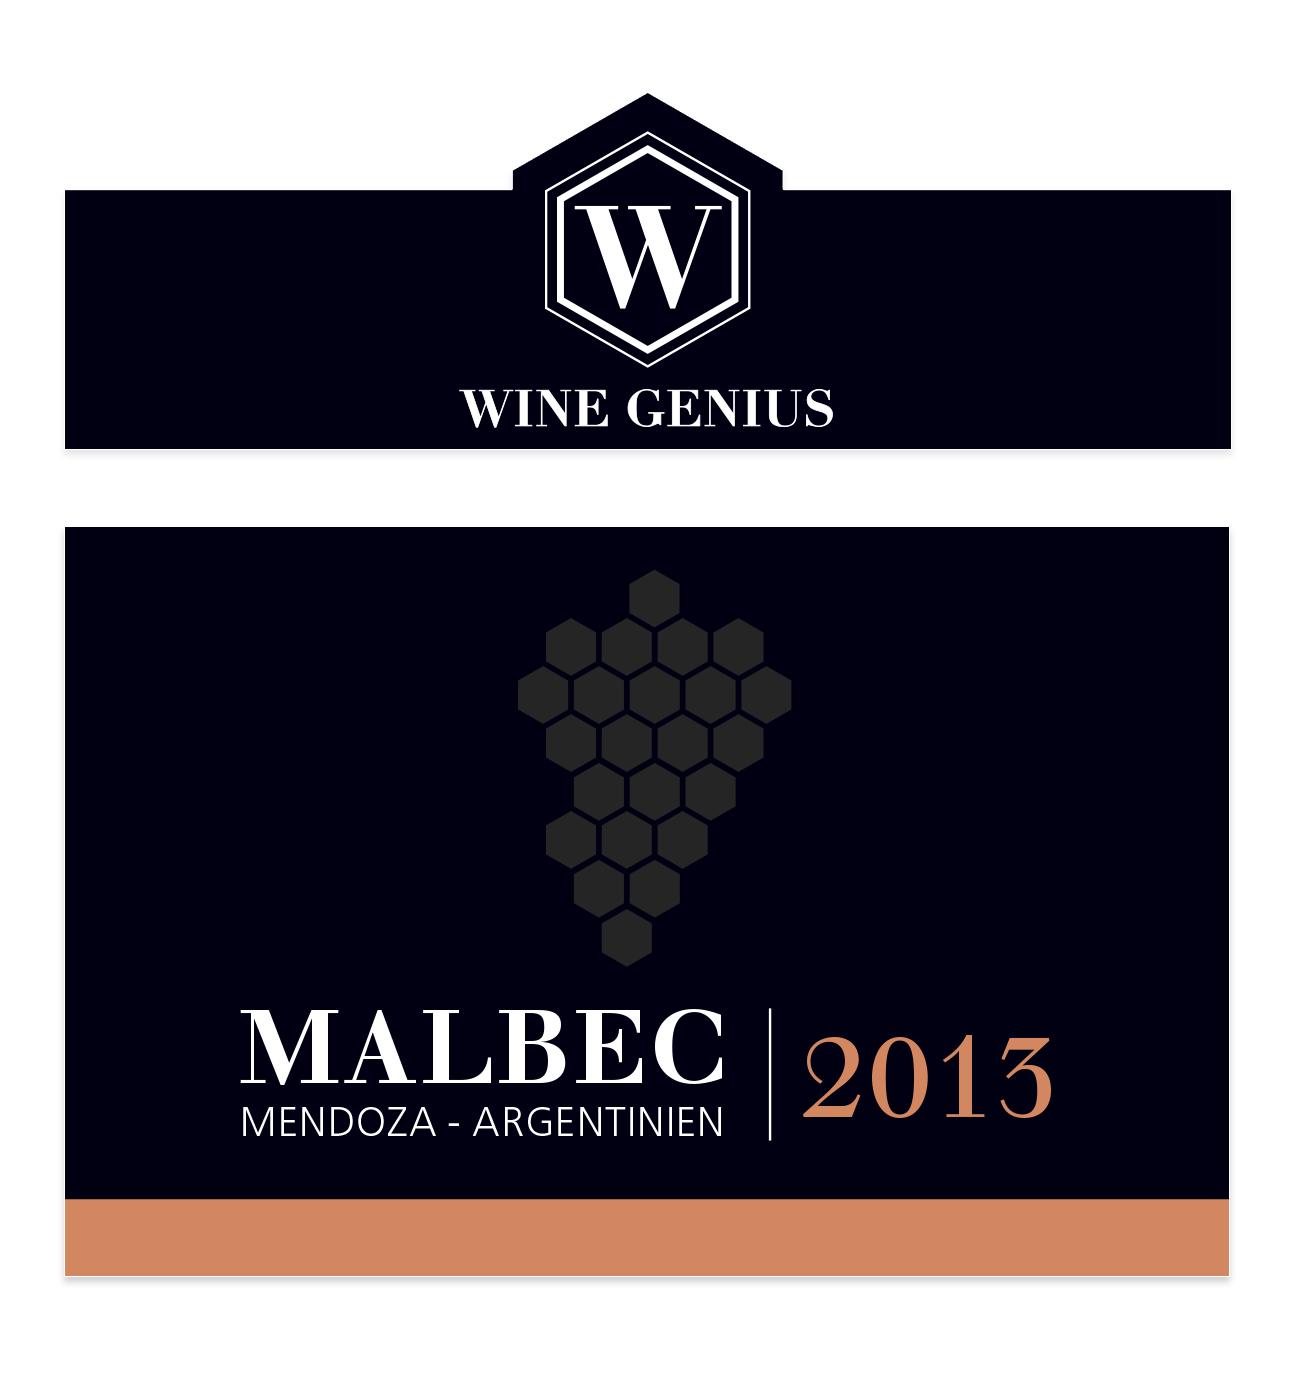 Malbec Wine Label Design & Web Branding